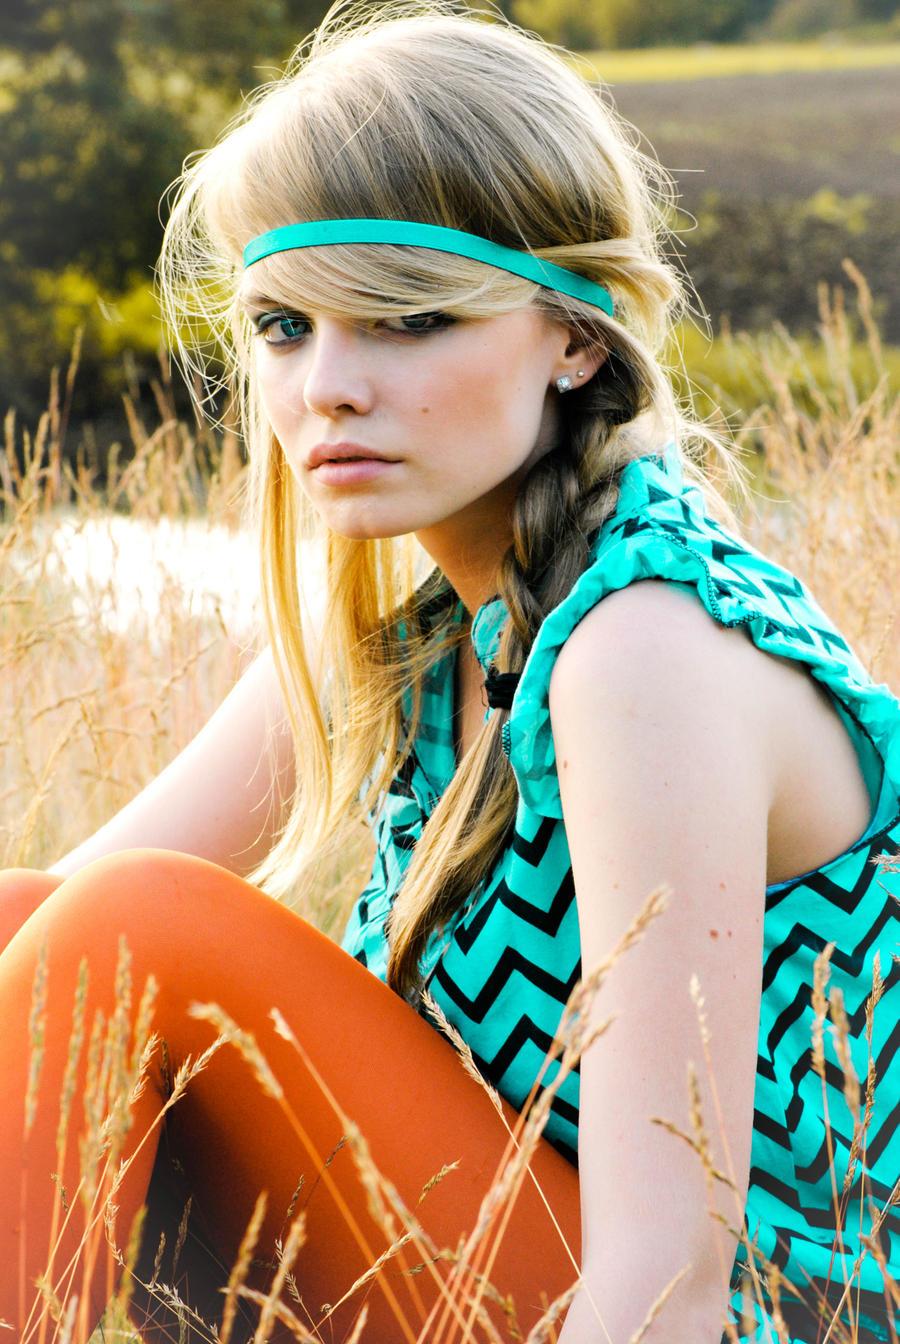 Colourful Hippie Girl by jolantajola1 on DeviantArt